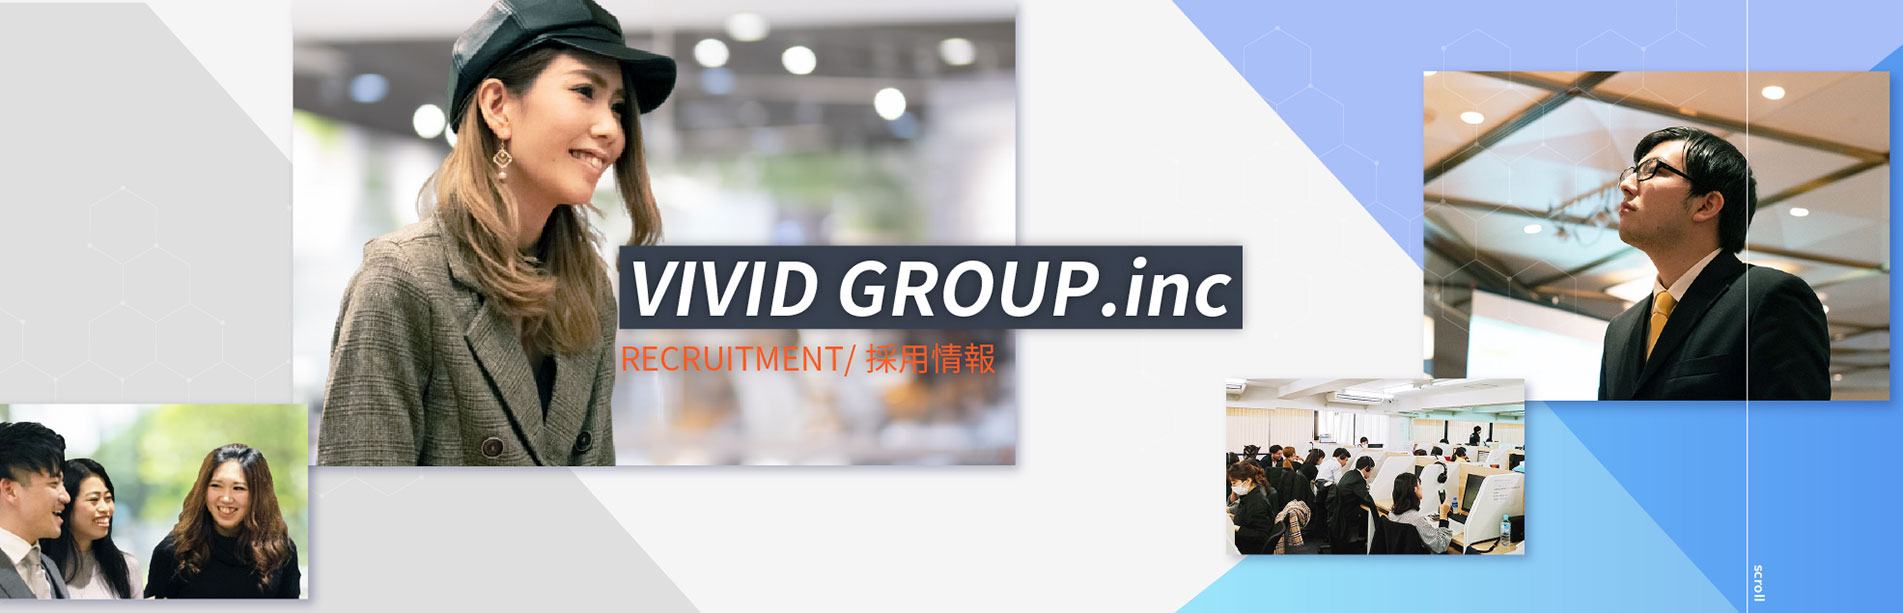 VIVID GROUP.inc RECRUITMENT 採用情報